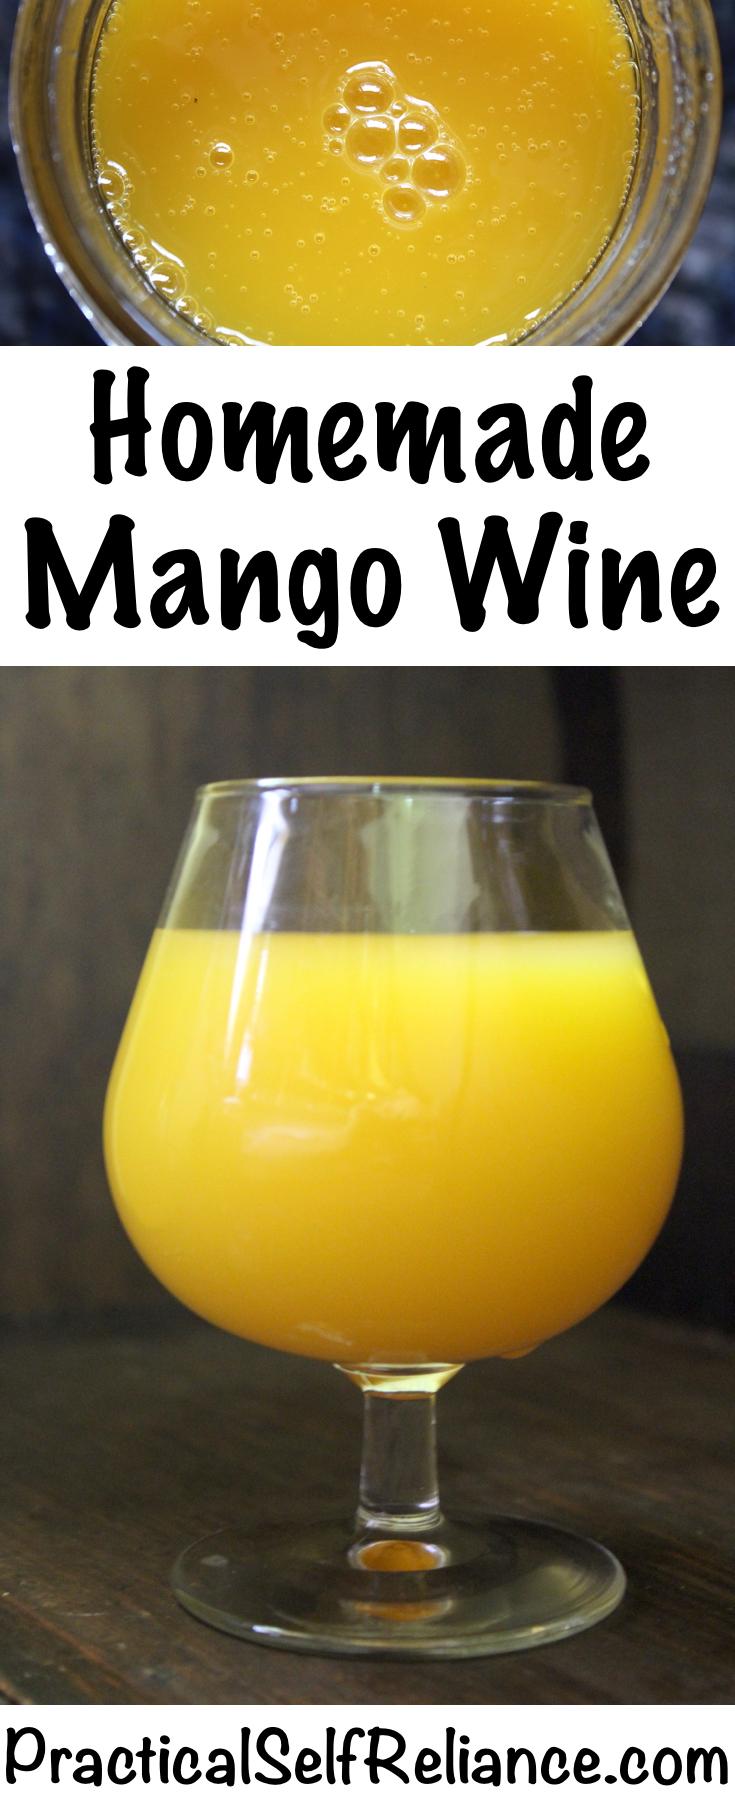 Homemade Mango Wine Recipe #mango #mangorecipe #mangodrink #fermenting #winemaking #brewing #homebrewing #homebrew #beverages #homemade #fermented #fermenteddrink #wine #winerecipe